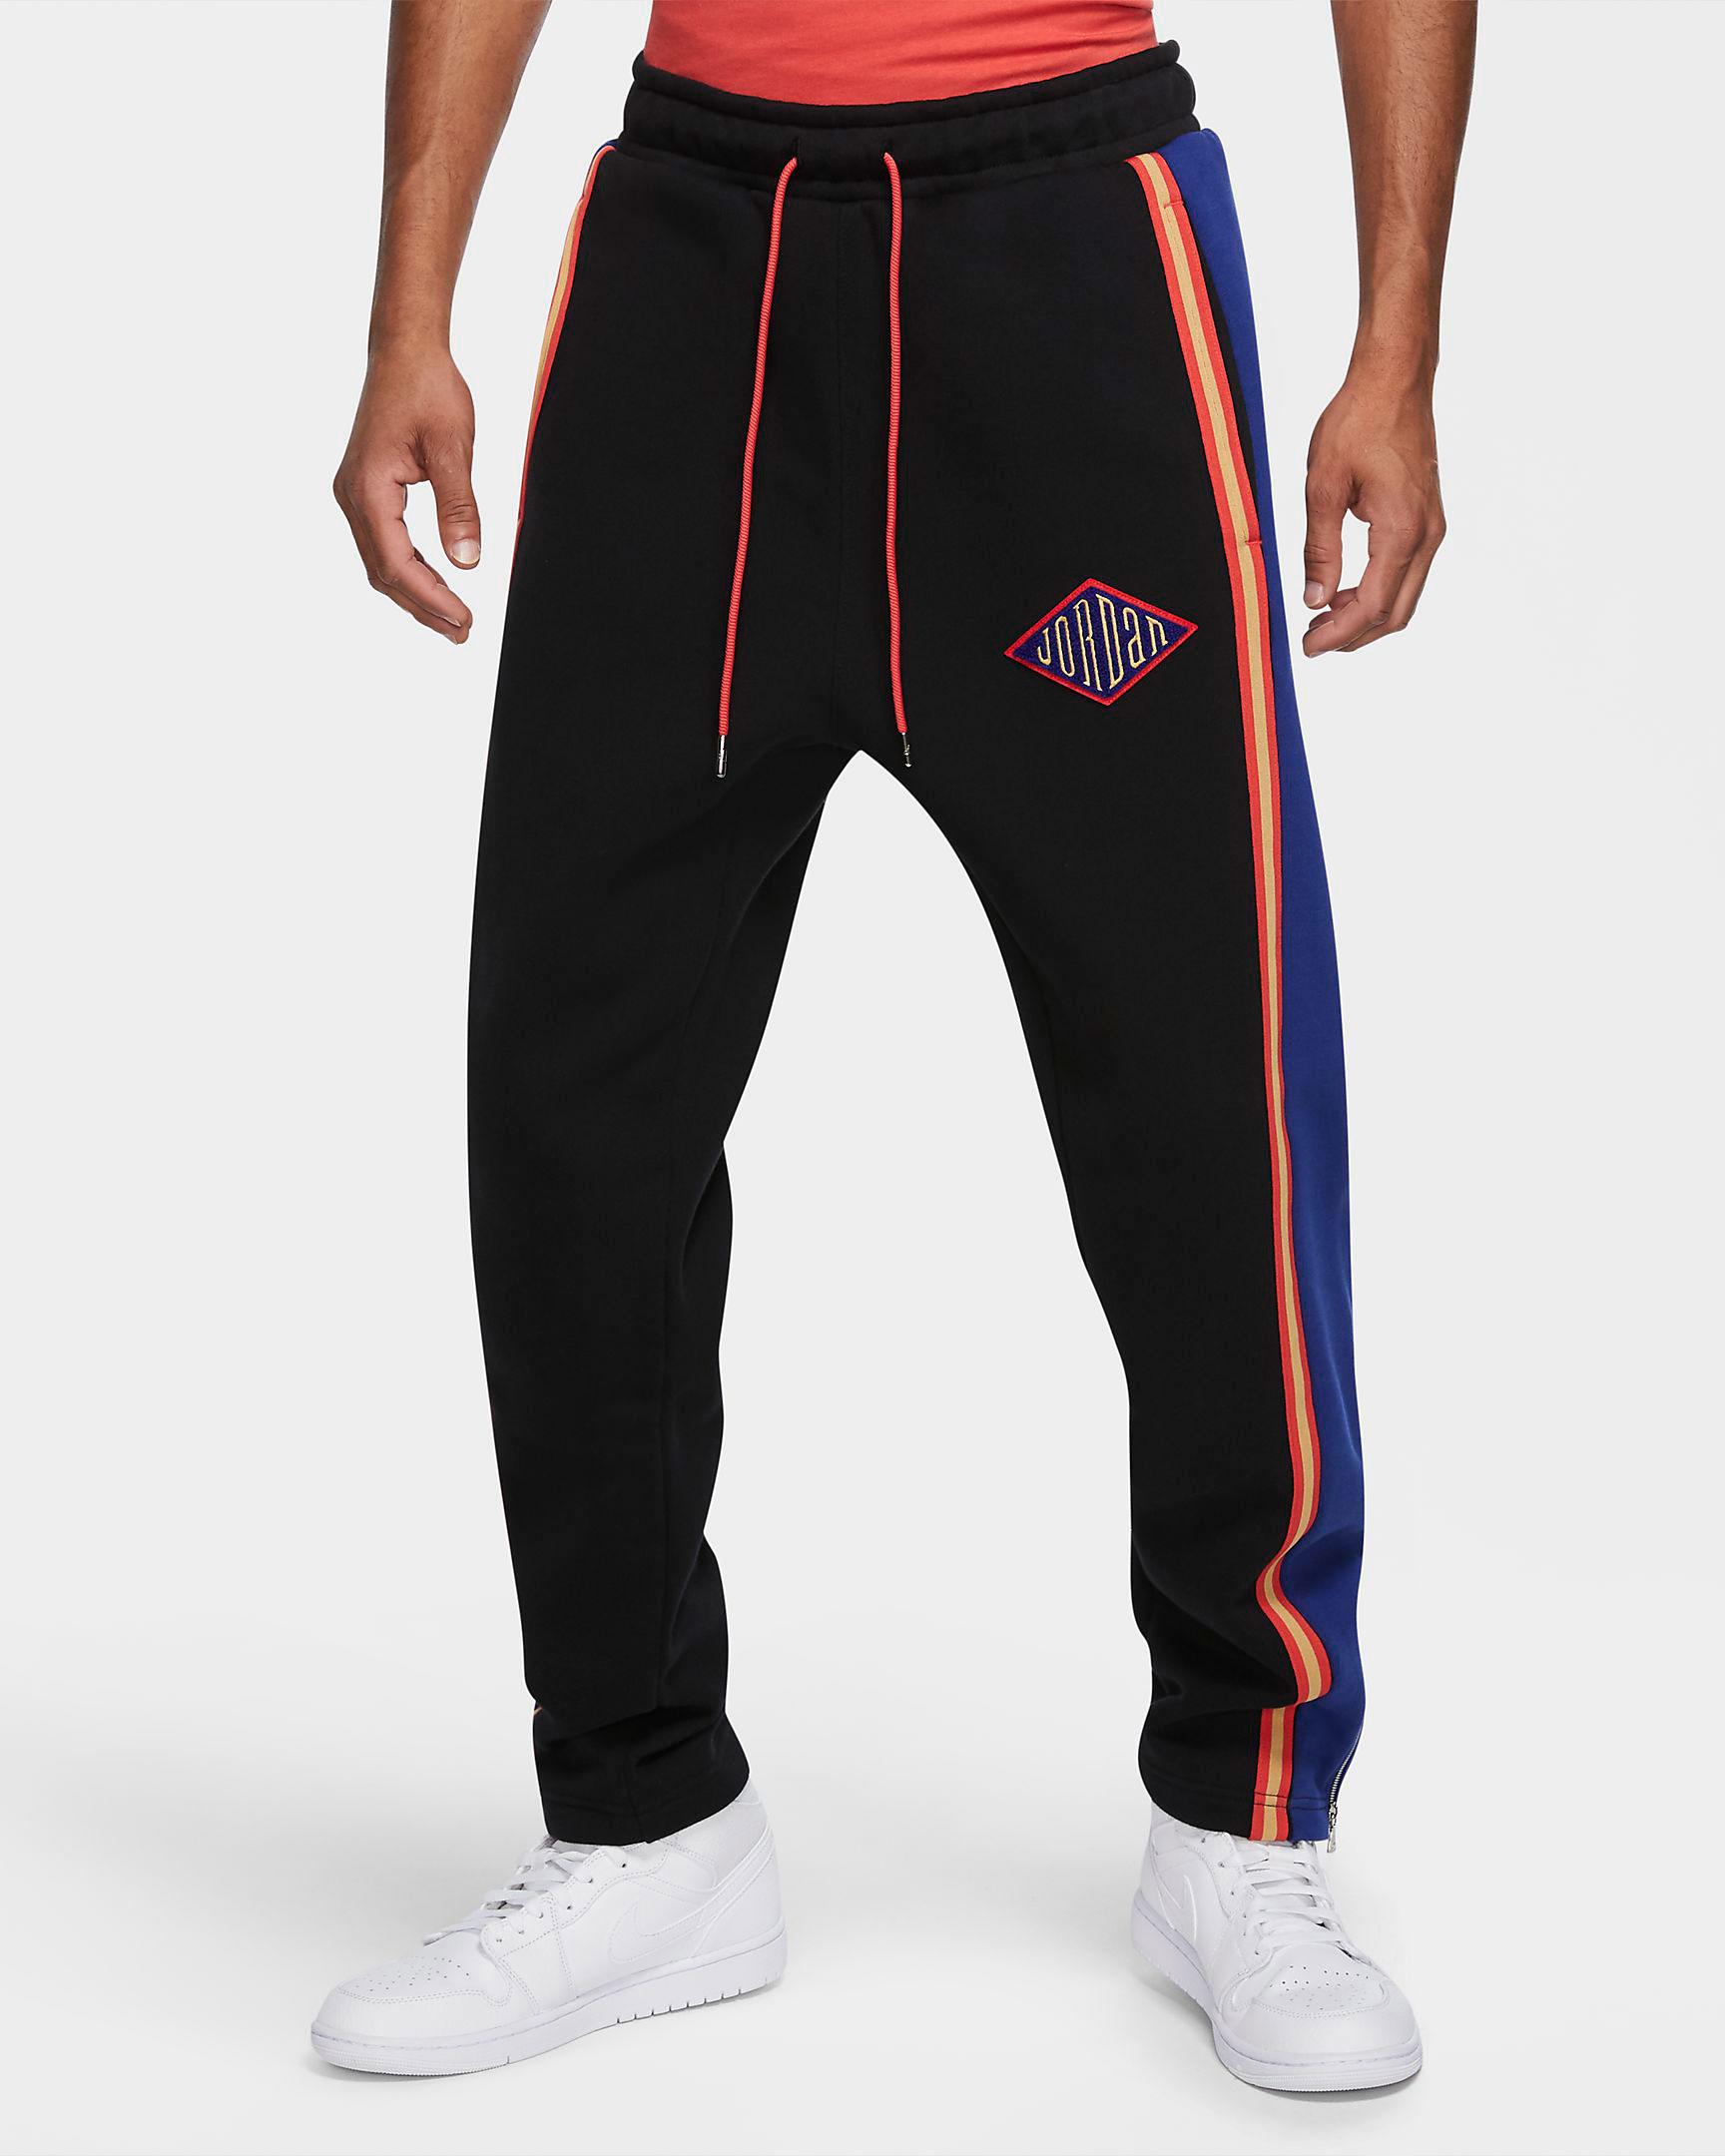 jordan-sport-dna-pants-black-royal-1